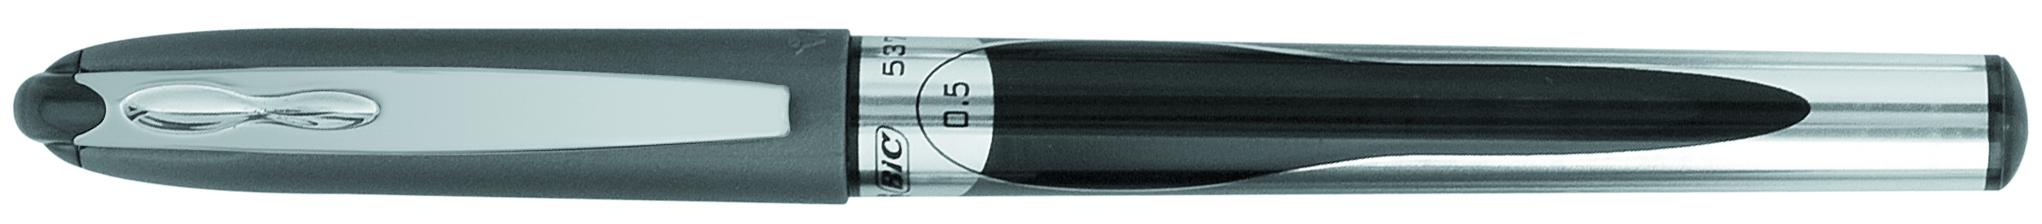 ROLLER 0.5MM NEGRU 537R BIC